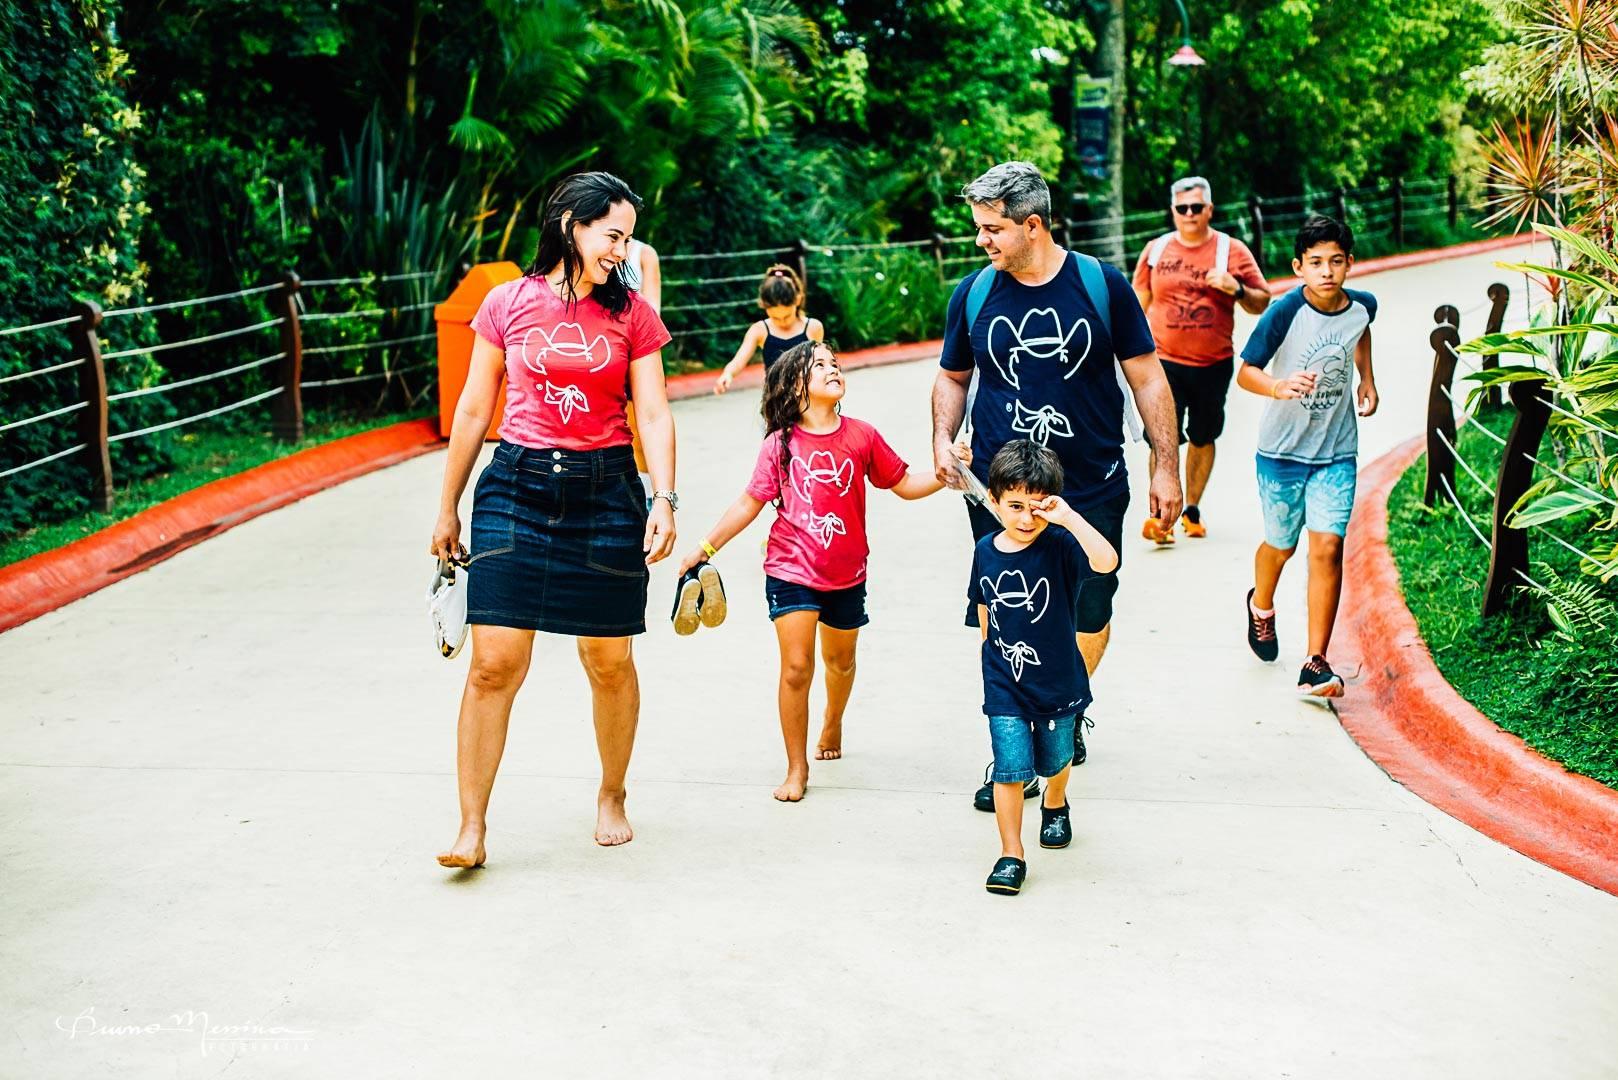 fotos familia Beto Carrero World - ensaio familia no Beto Carrero - fotos no Beto Carrero World - Fotografo Beto Carrero World - Ensaio Beto Carrero World